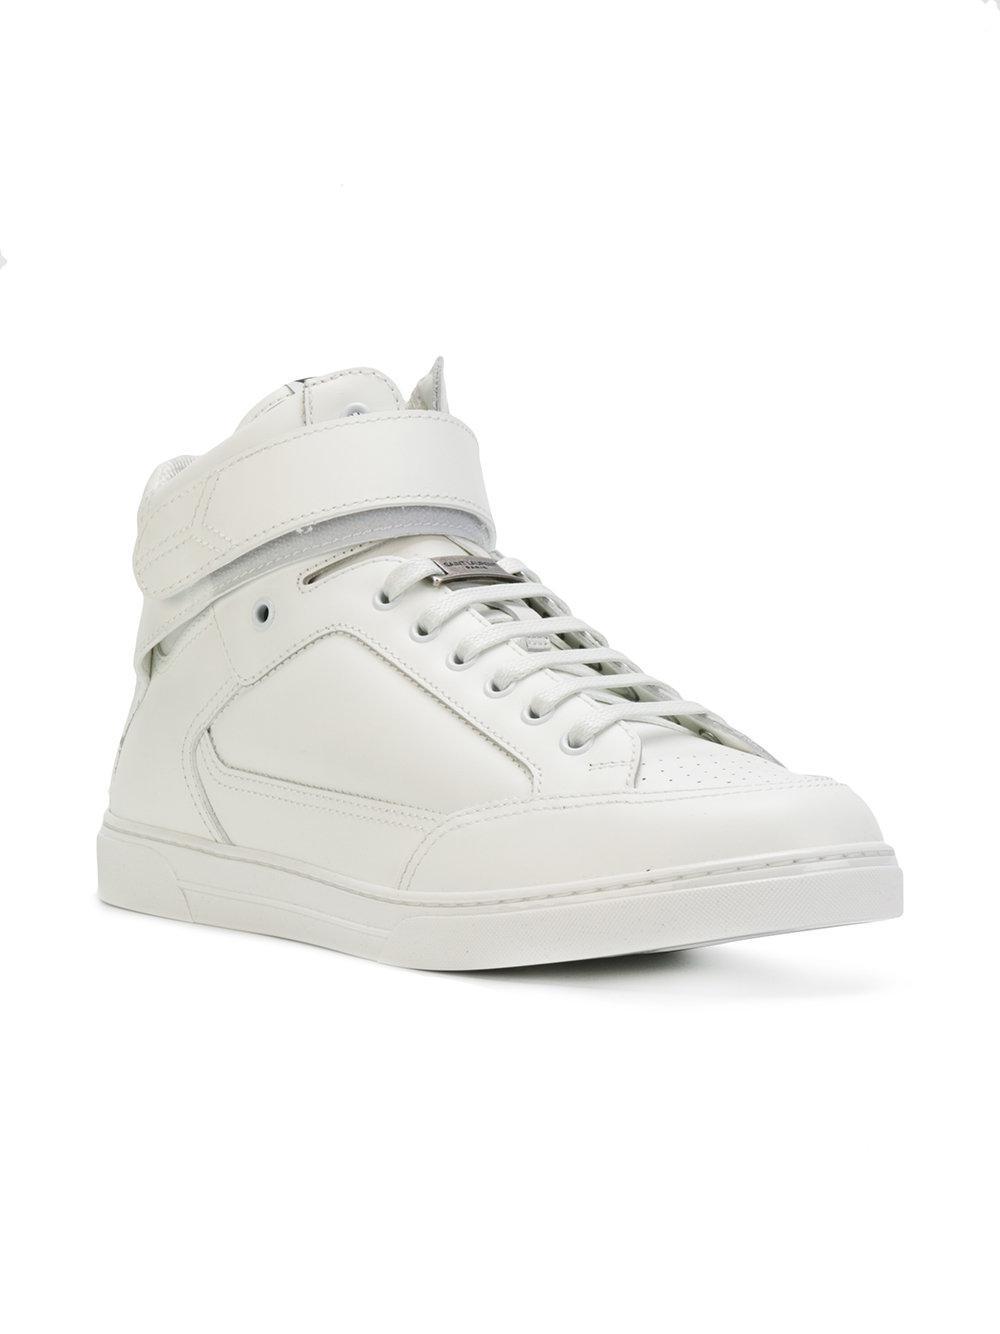 Saint Laurent Joe Scratch High-Top Sneakers CEyY4uR5m0